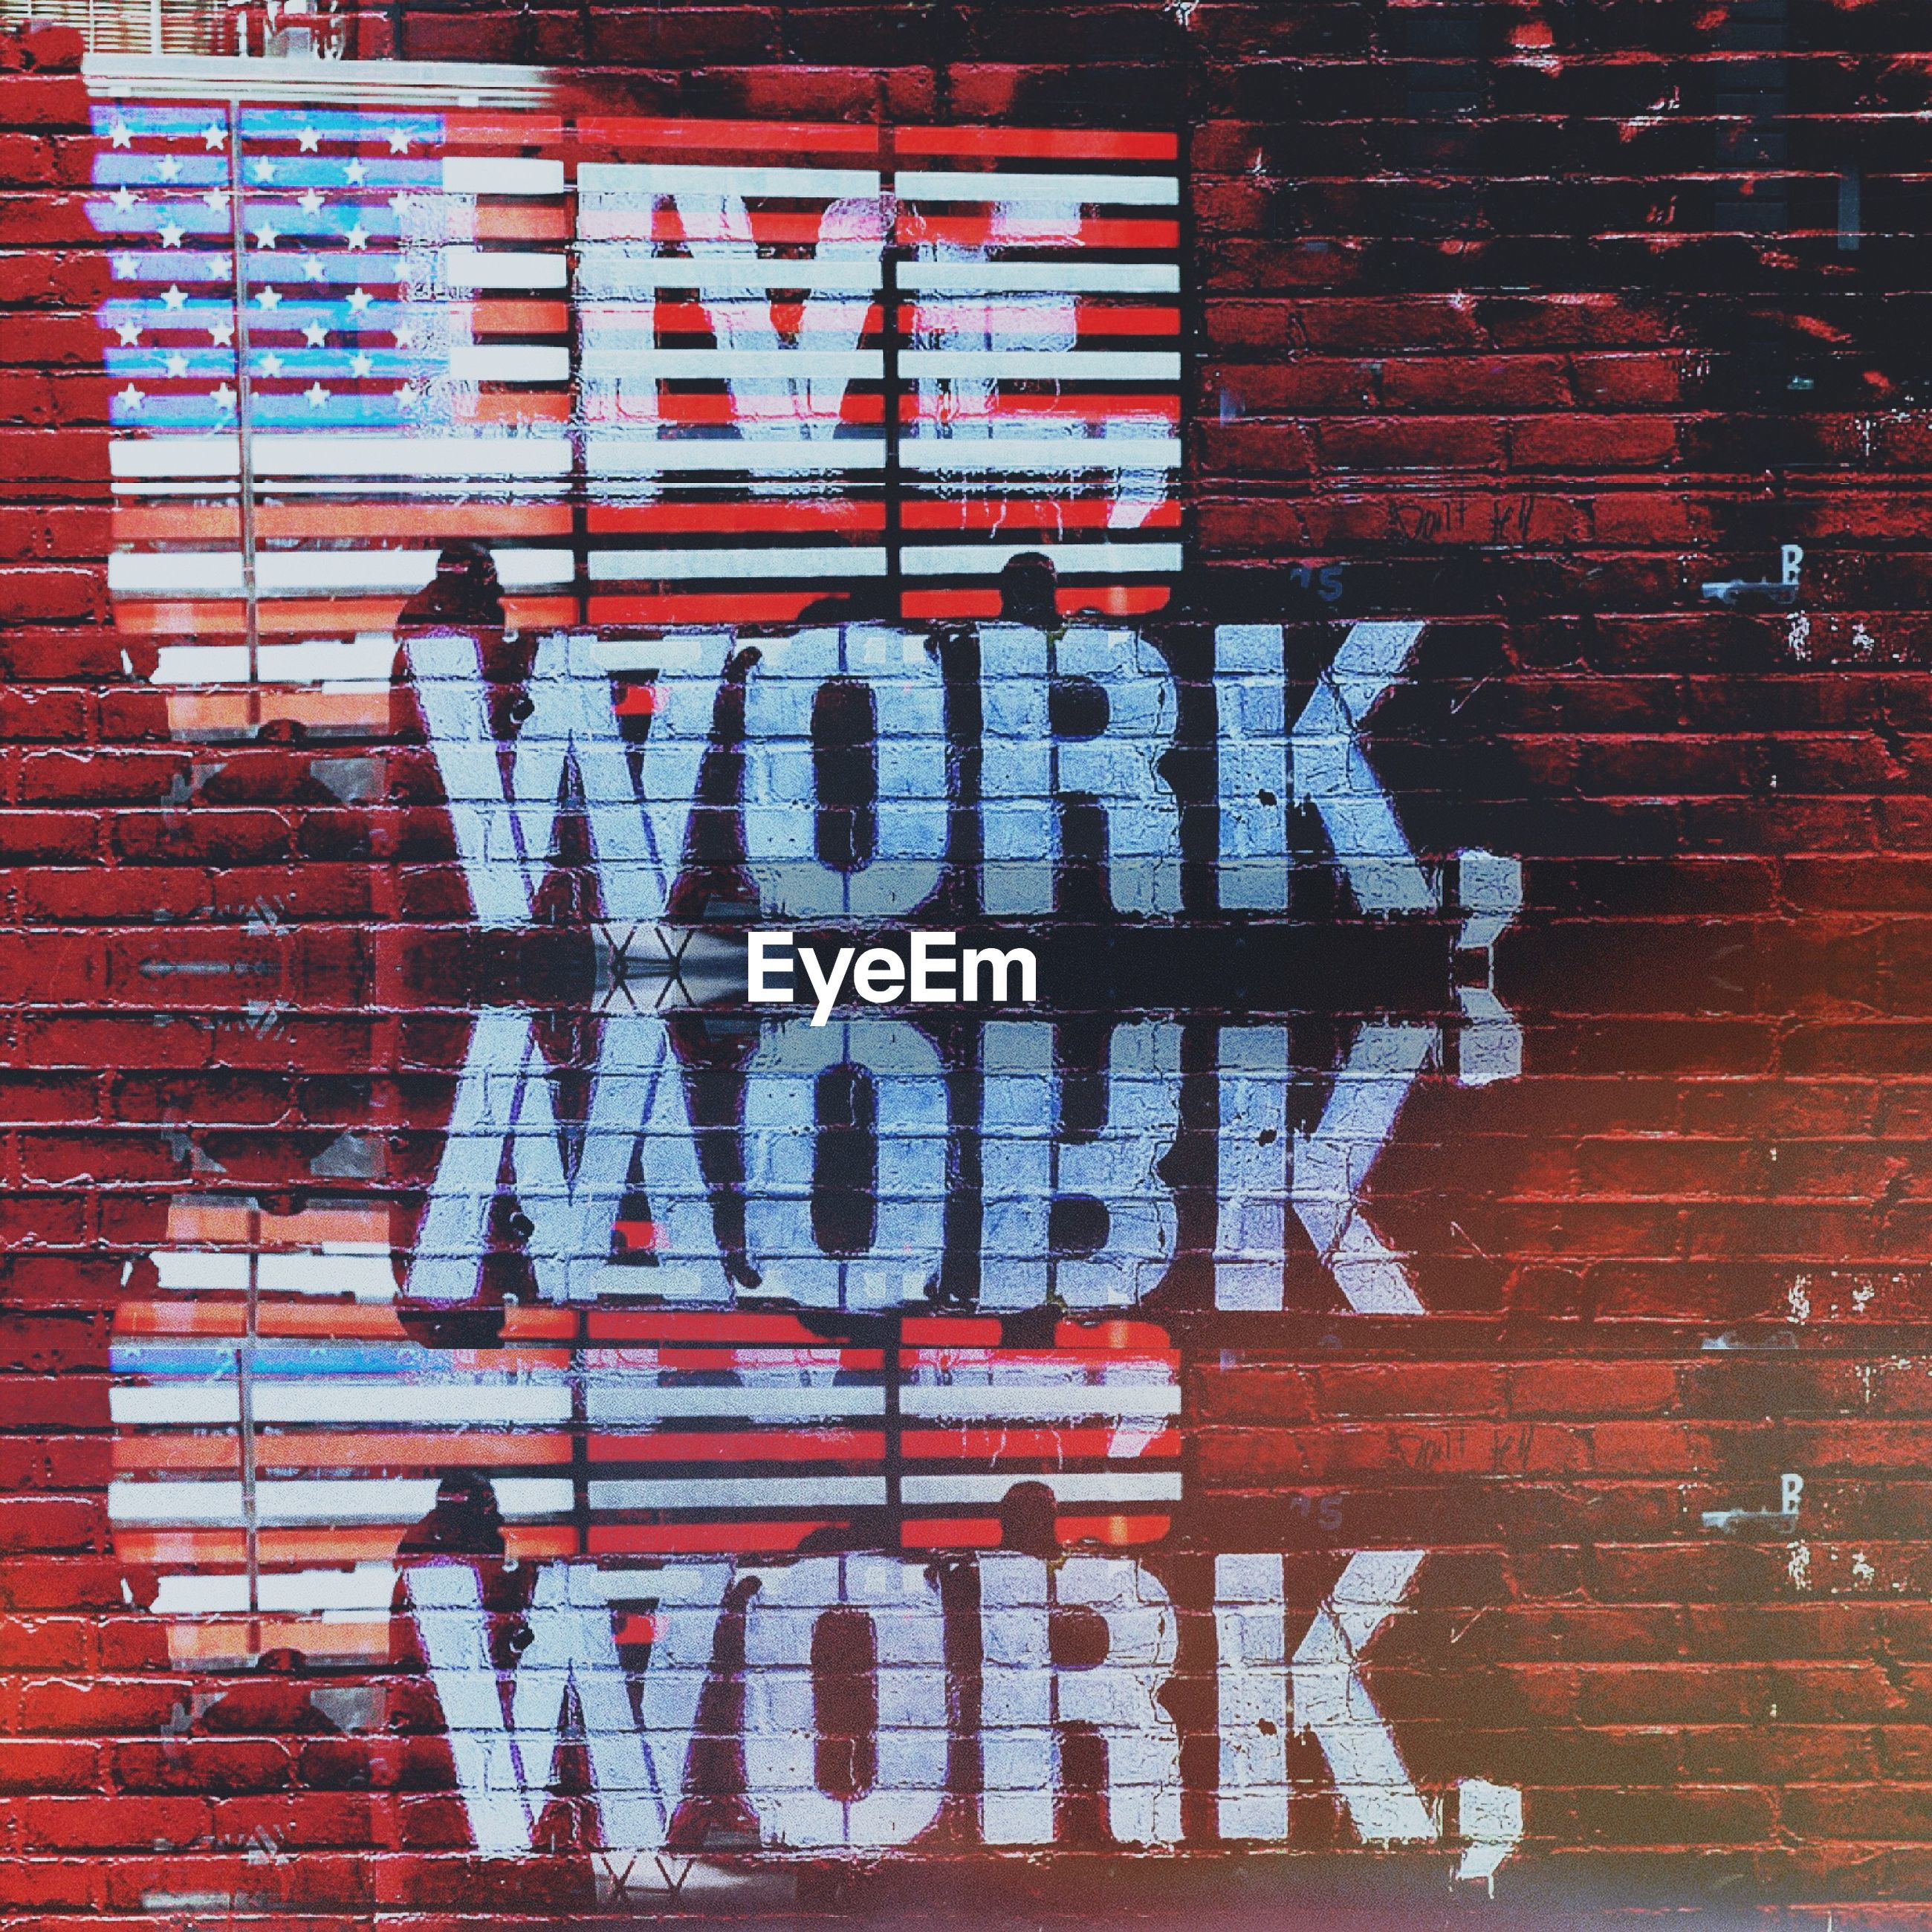 Text on brick wall